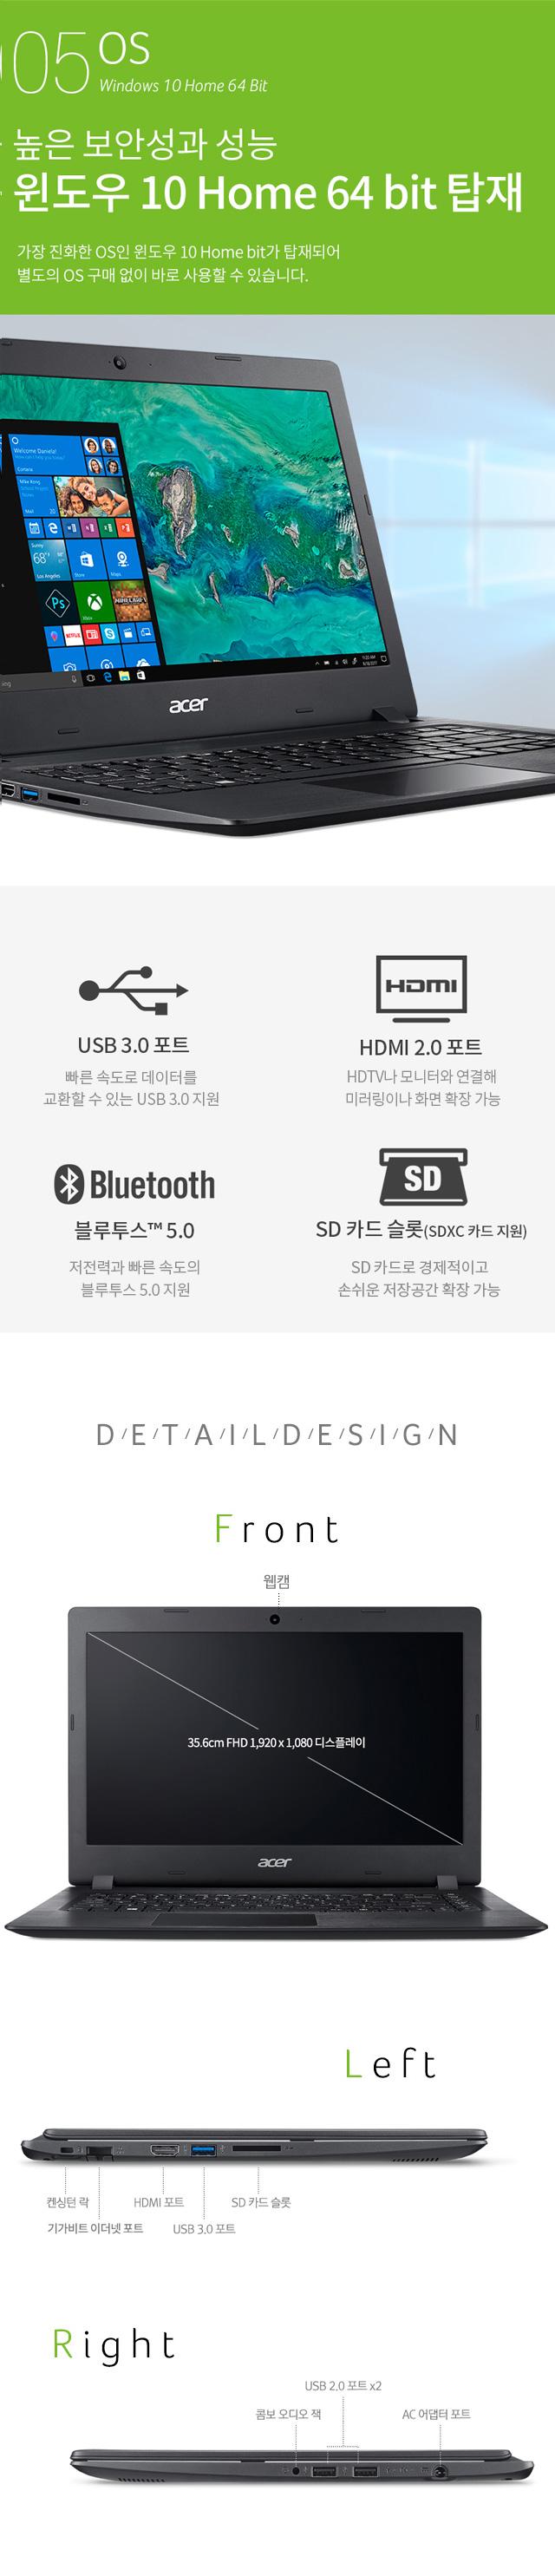 05 OS Windows 10 Home 64 Bit 높은 보안성과 성능 윈도우 10 Home 64 bit 탑재 가장 진화한 OS인 윈도우 10 Home bit가 탑재되어 별도의 OS 구매 없이 바로 사용할 수 있습니다. -USB 3.0 포트 빠른 속도로 데이터를 교환할 수 있는 USB 3.0 지원 -HDMI 2.0 포트 HDTV나 모니터와 연결해 미러링이나 화면 확장 가능 -블루투스TM 5.0 저전력과 빠른 속도의 블루투스 5.0 지원 -SD 카드 슬롯(SDXC 카드 지원) SD카드로 경제적이고 손쉬운 저장공간 확장 가능 -Front : 웹캠, 35.6cm FHD 1,920 X 1,080 디스플레이 -Left : 켄싱턴 락, 기가비트 이더넷 포트, HDMI 포트, USB 3.0 포트, SD 카드 슬롯 -Right : 콤보 오디오 잭, USB 2.0 포트 X2, AC 어댑터 포트